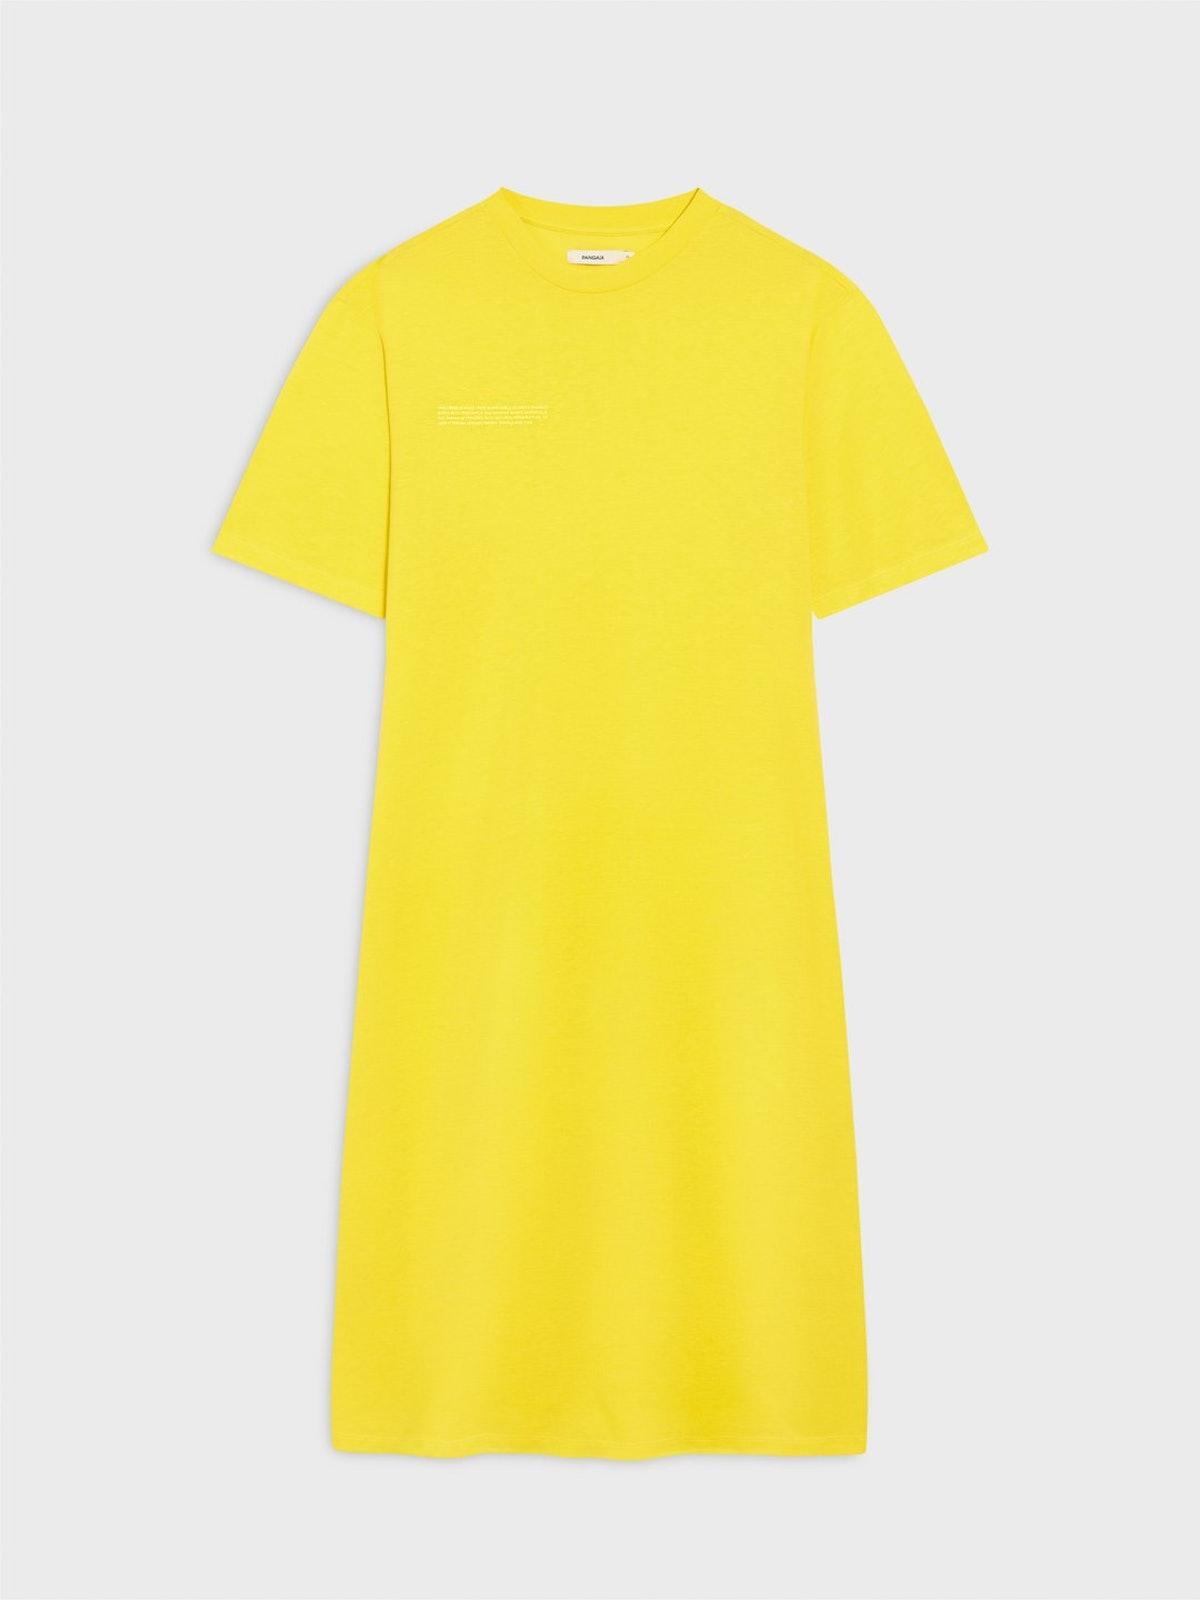 FRUTFIBER™ Maxi T-Shirt Dress in Yellow from PANGAIA.